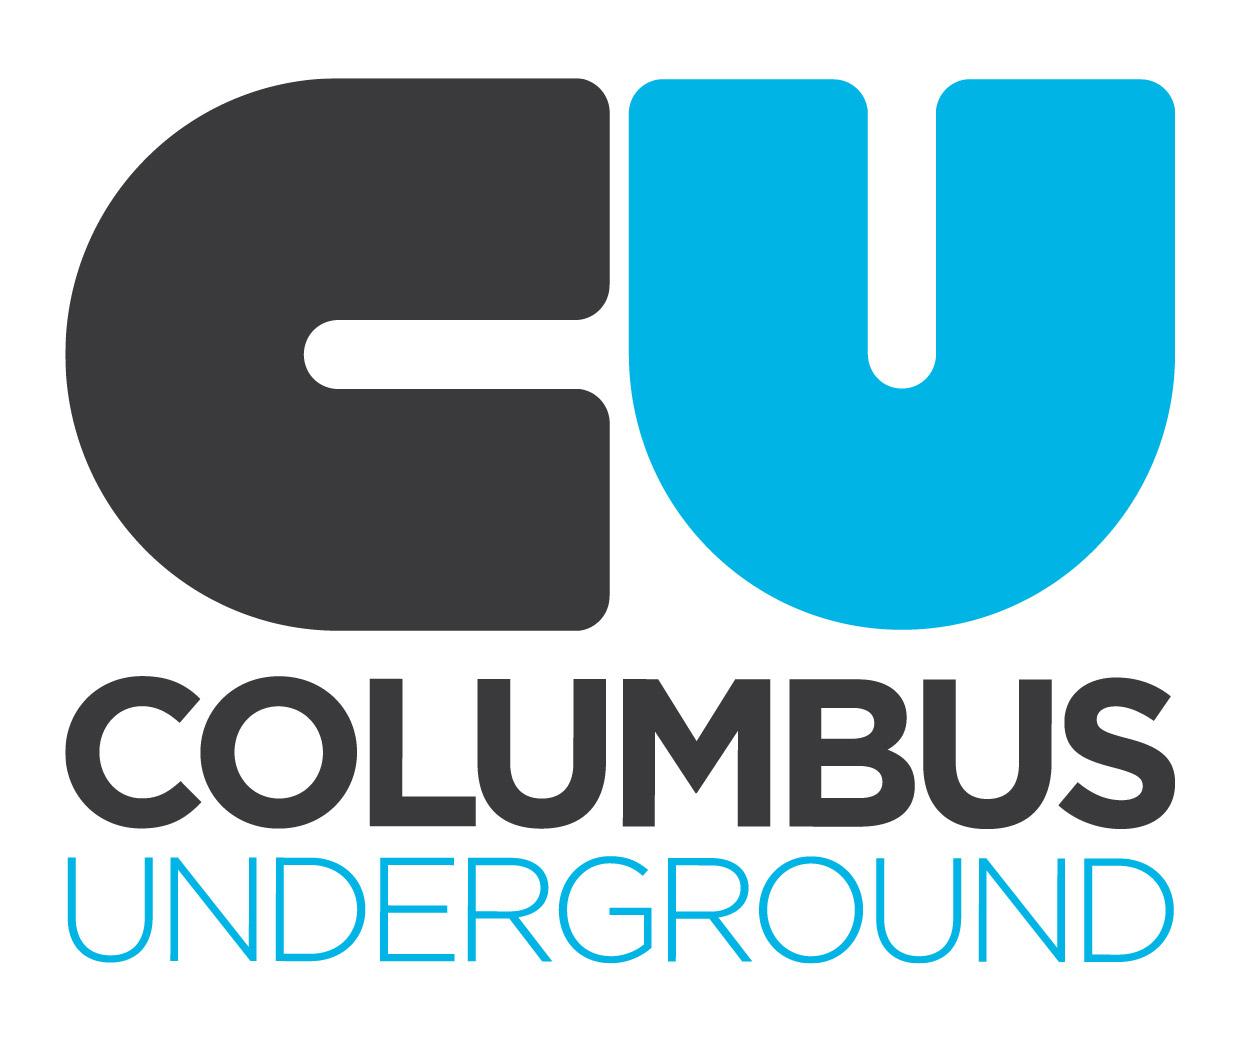 cu-logo-blue-white.jpg